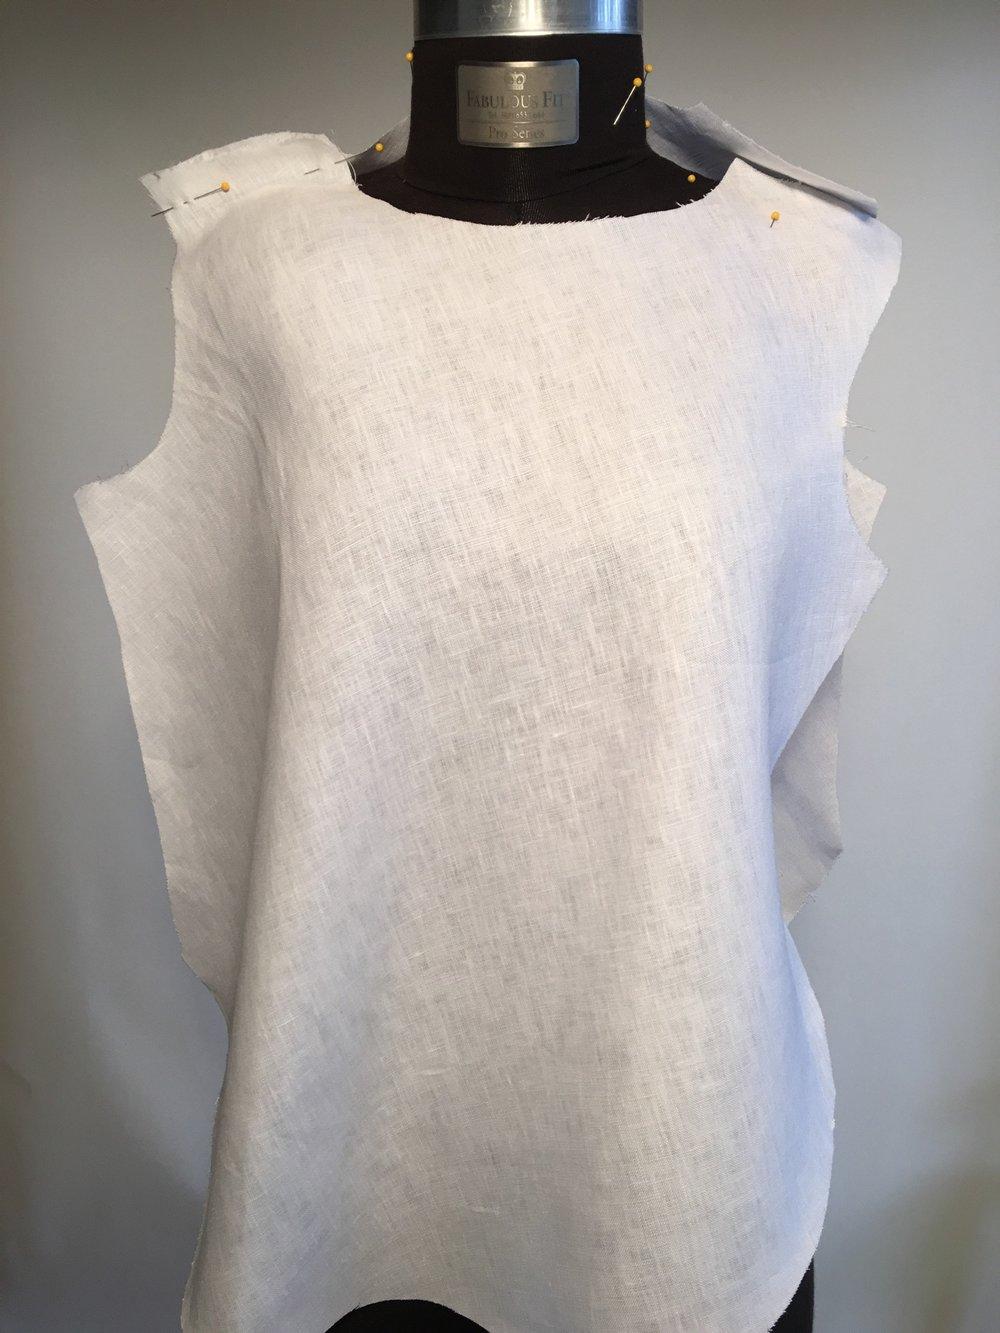 blouse front.jpg